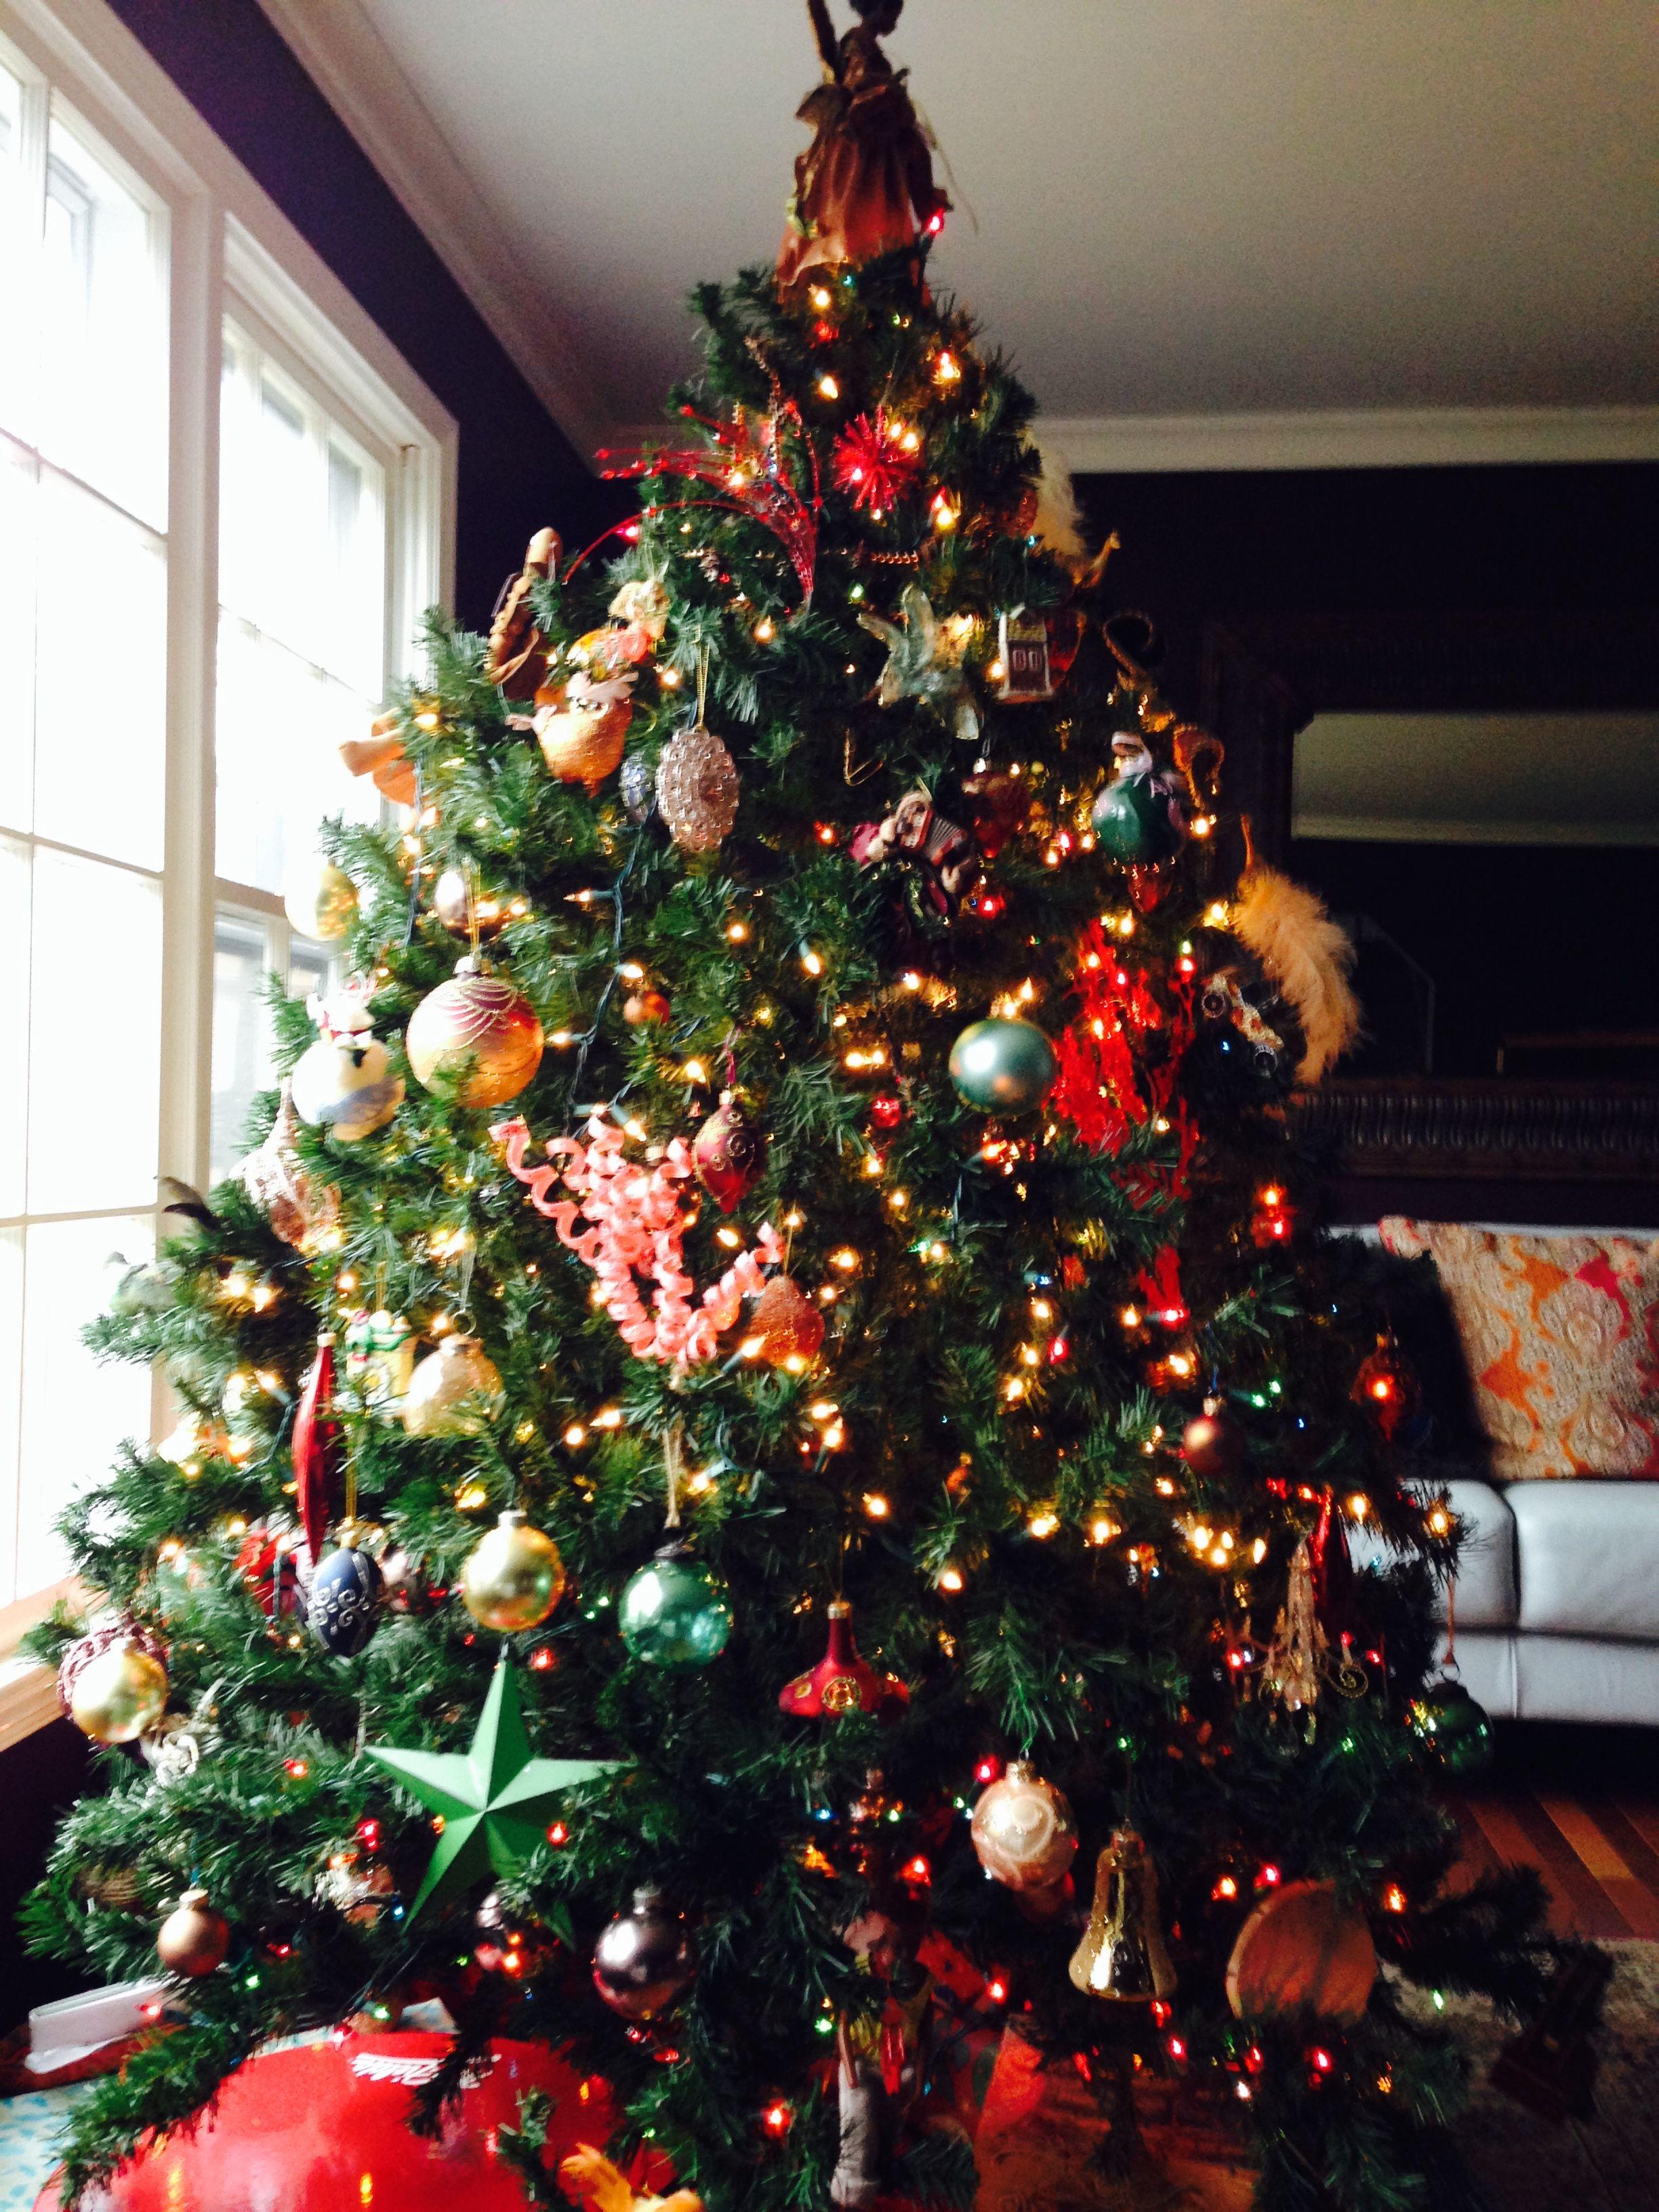 Christmas 2013 Hope Inspiration Movingforwardgracefully Aboveitalllove Manifest2014 Bedoact Christmas Holiday Cheer Christmas Tree